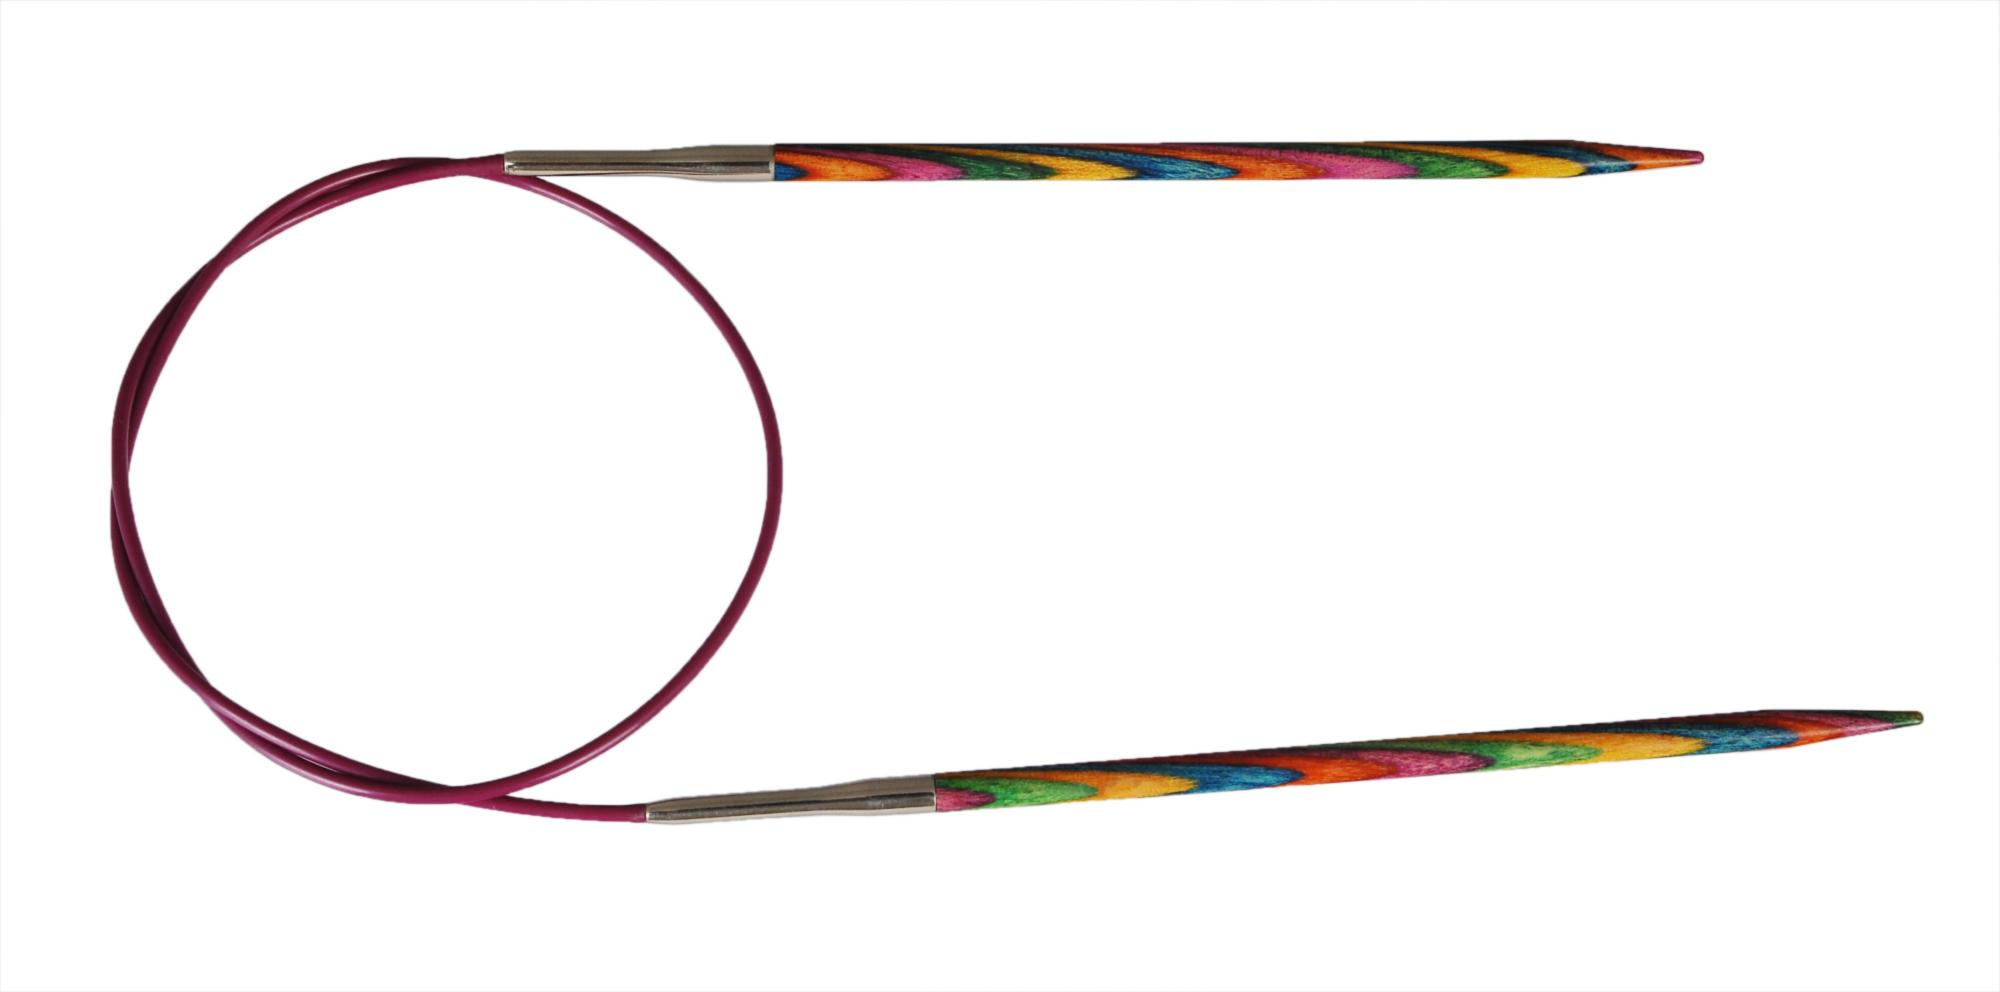 Спицы круговые 100 см Symfonie Wood KnitPro, 21358, 7.00 мм